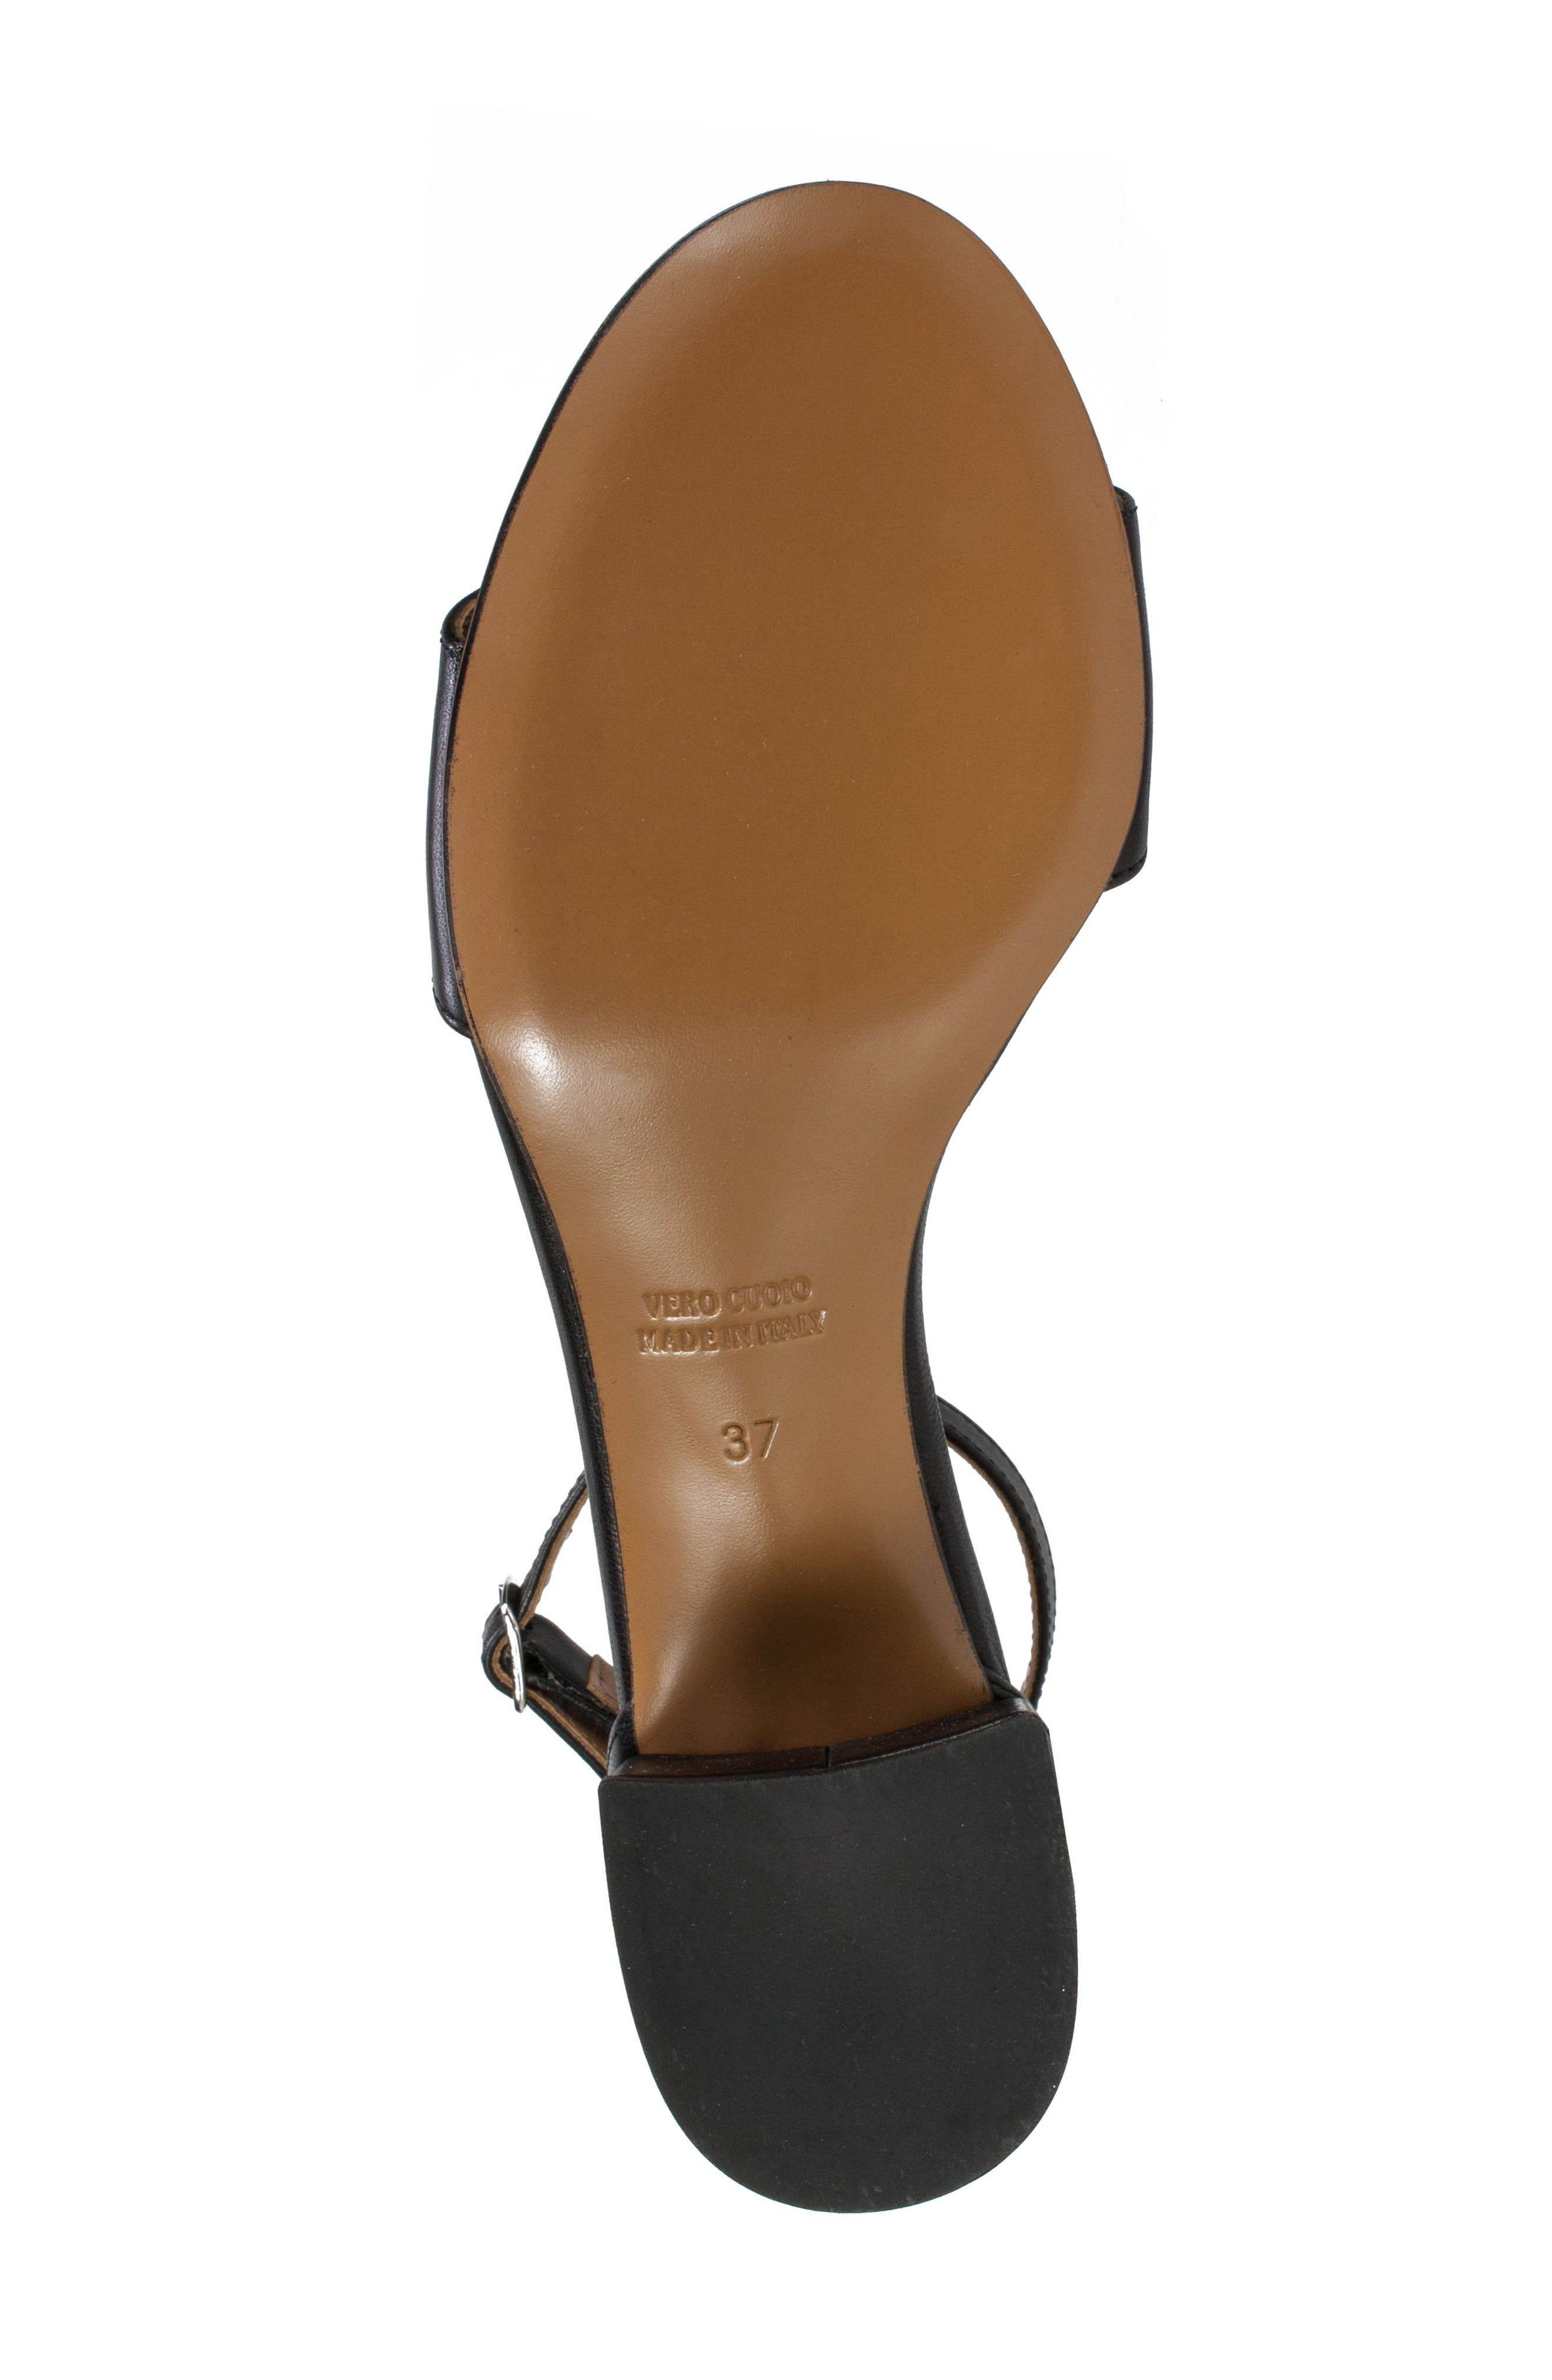 Ameila Block Heel Sandal,                             Alternate thumbnail 6, color,                             Black Leather